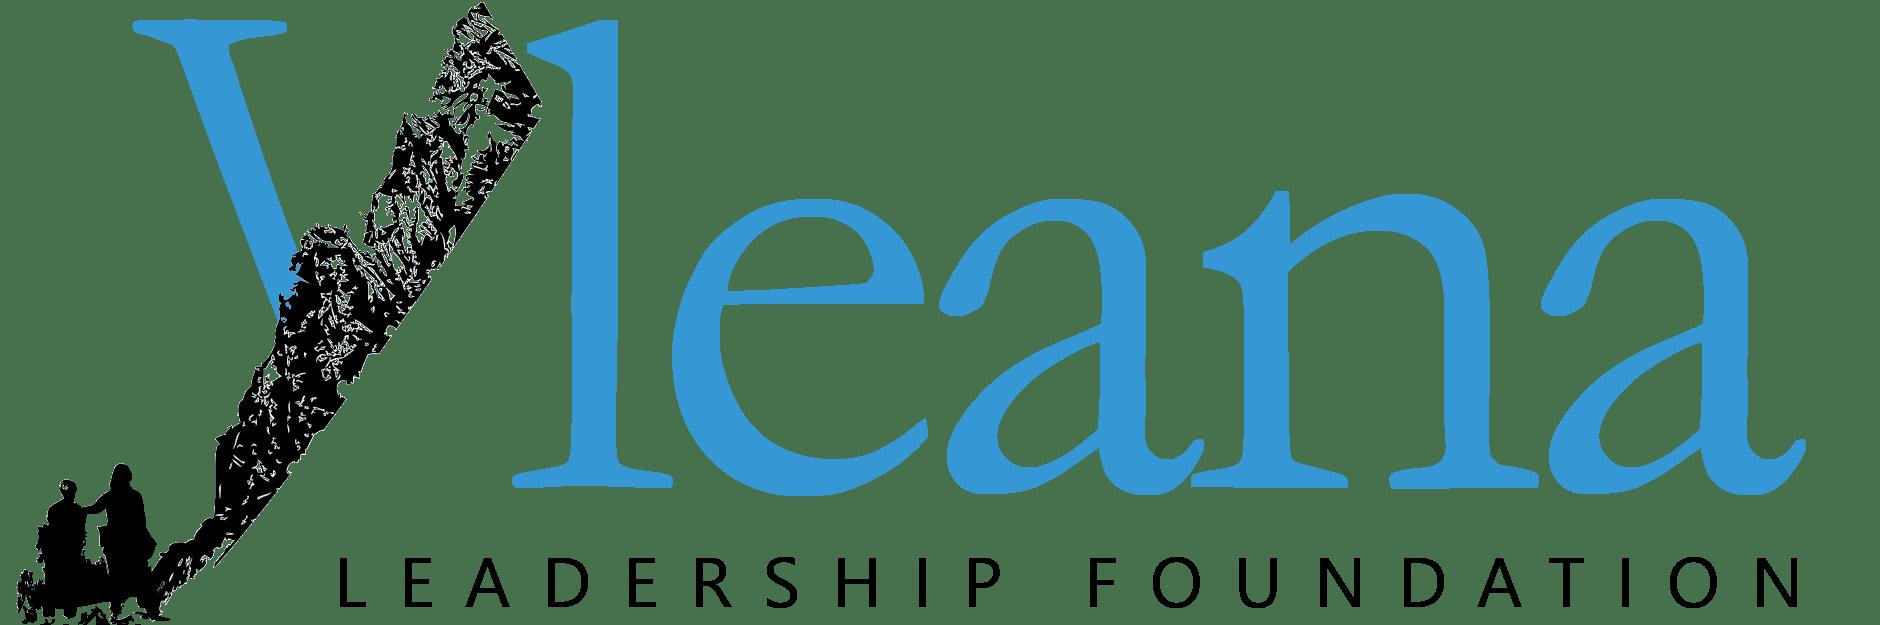 Yleana Leadership Foundation